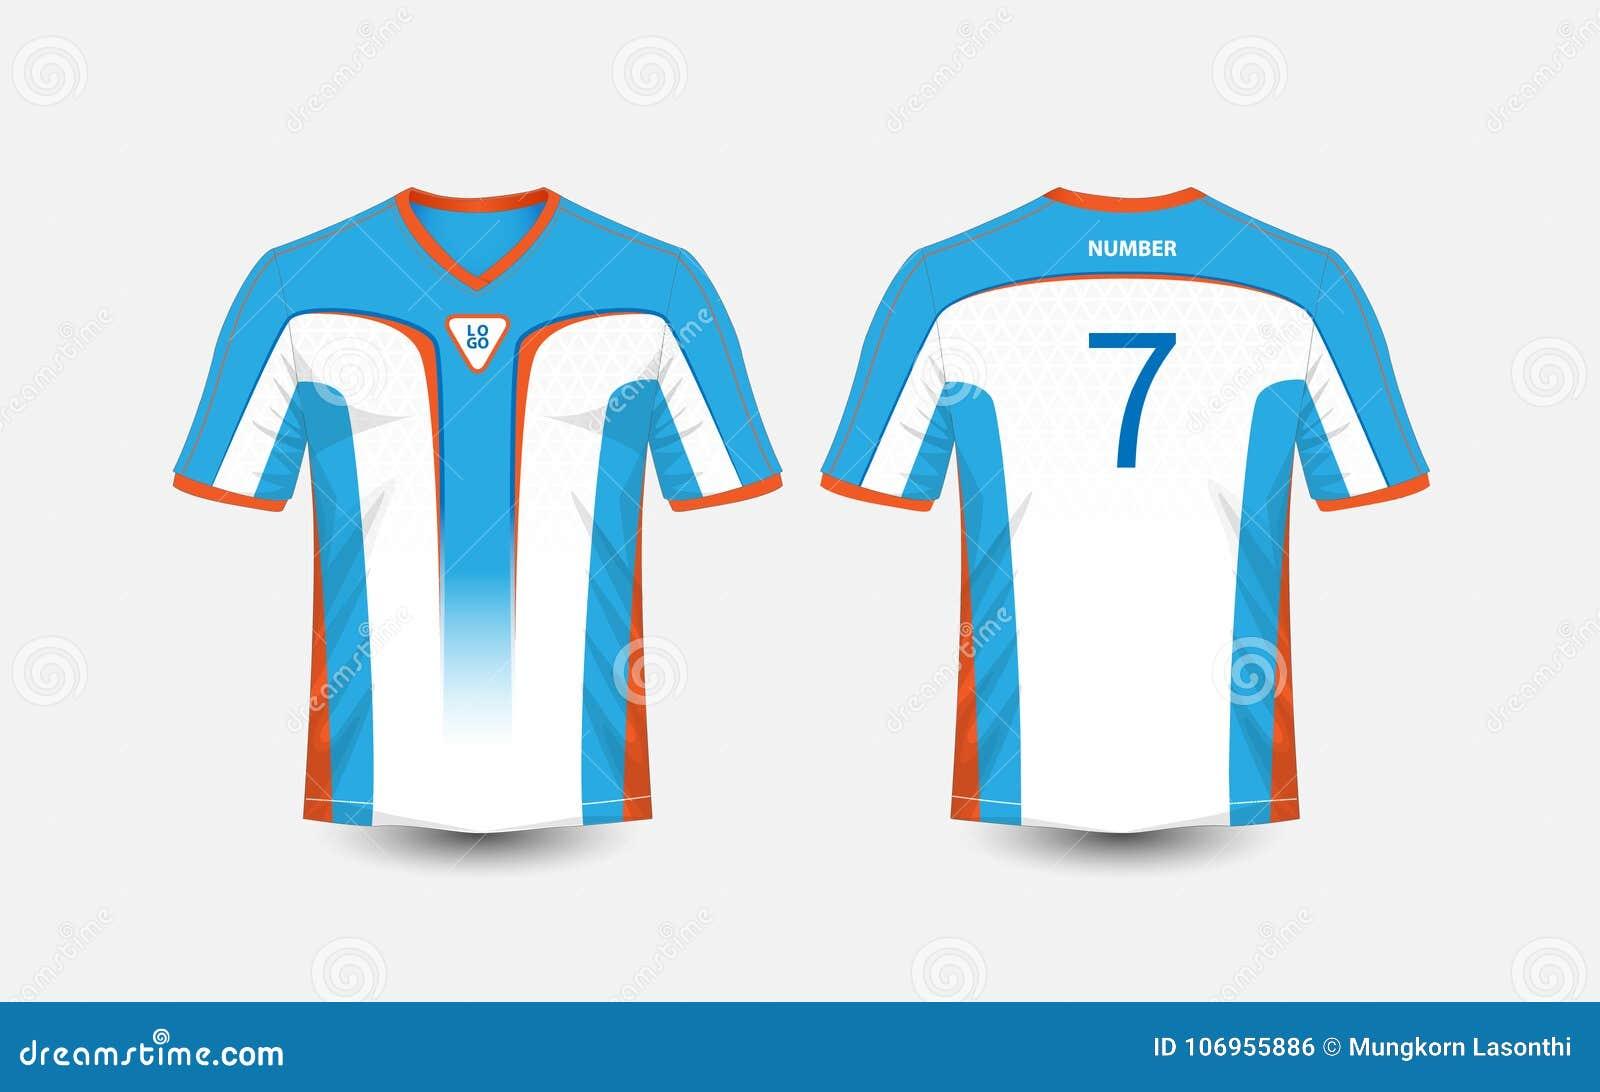 2f673a39 White, blue and orange pattern sport football kits, jersey, t-shirt design